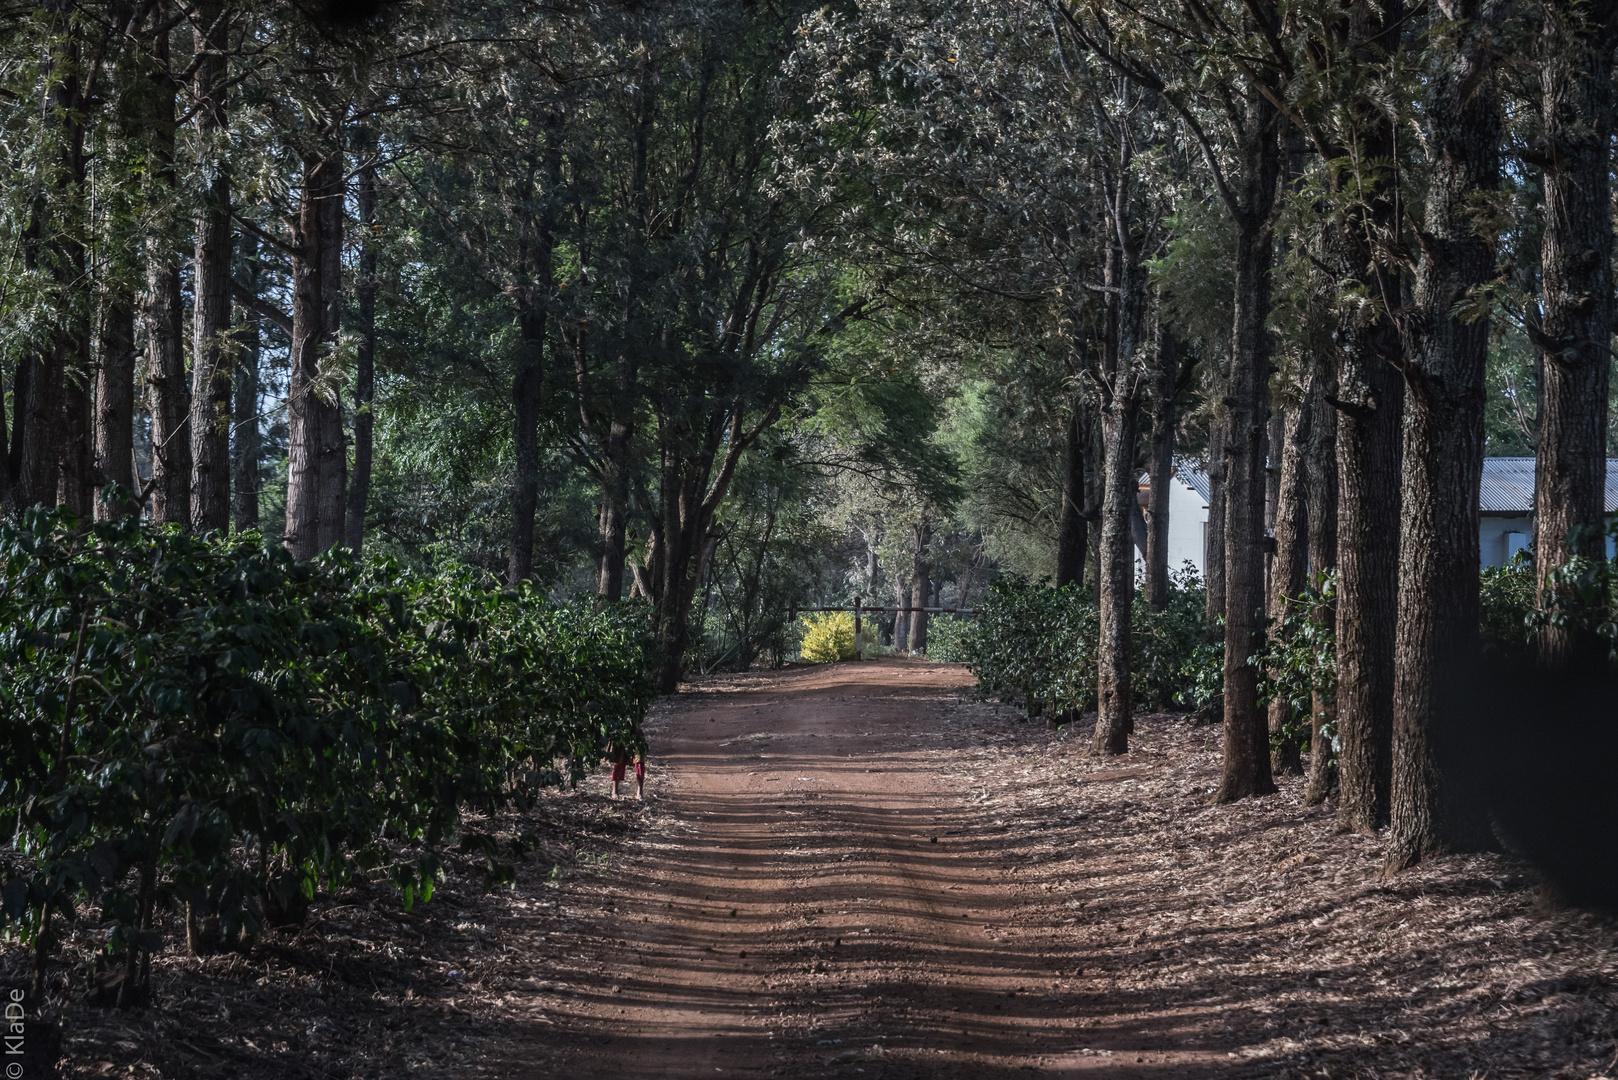 Tansania - Ngorongoro - Quartier im Karibuni Crater Forest Campted Camp